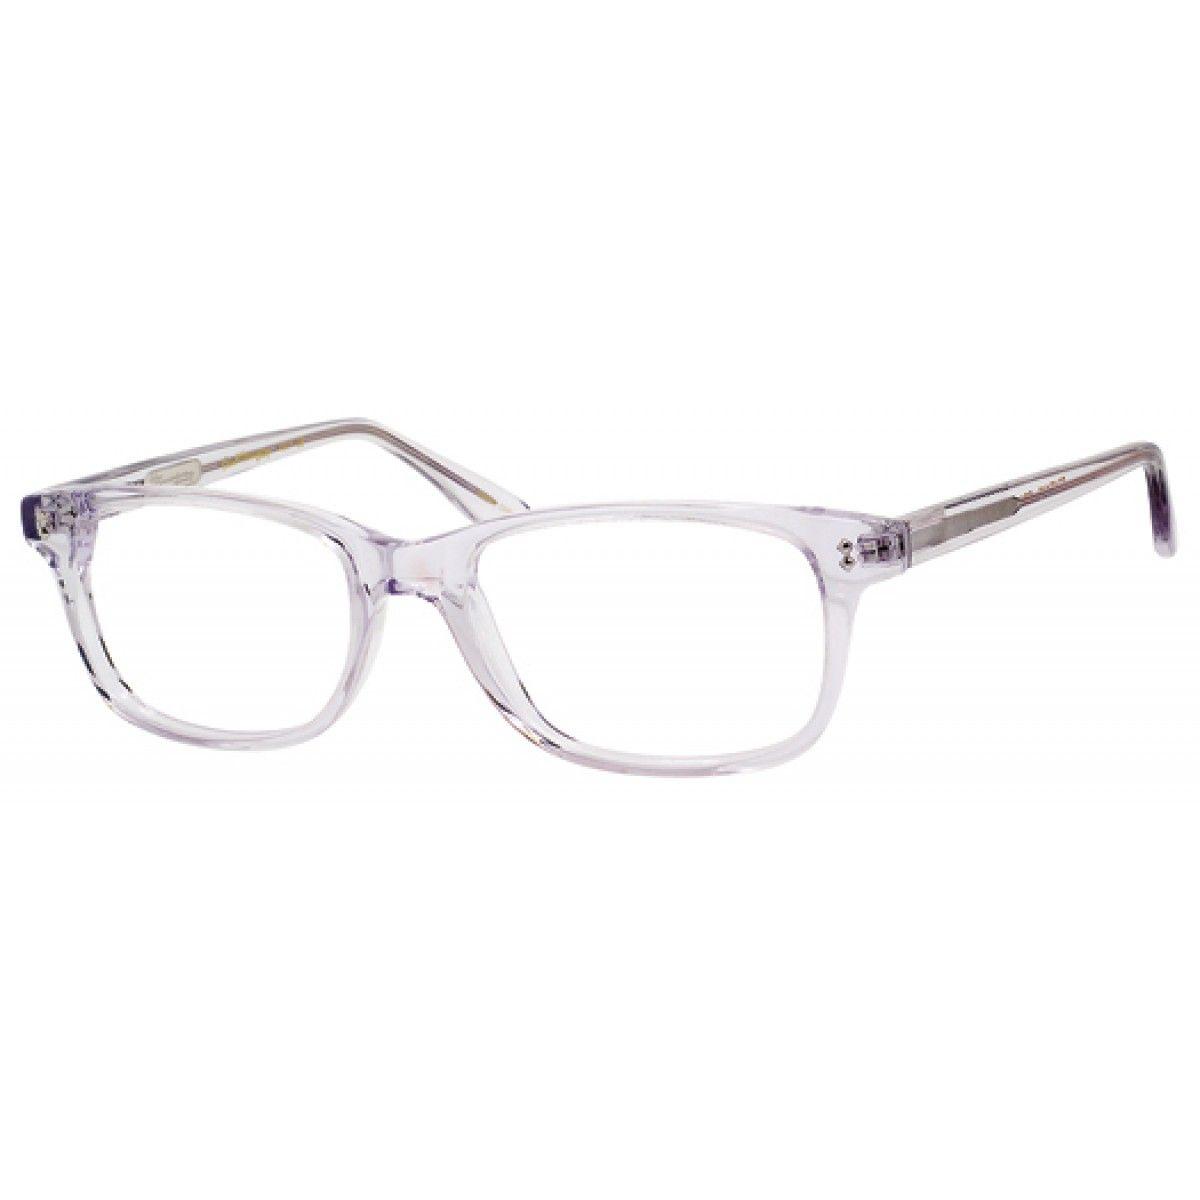 Shiny Tortoise Glasses - Eyeglass.com #womens #eyeglasses #frames ...